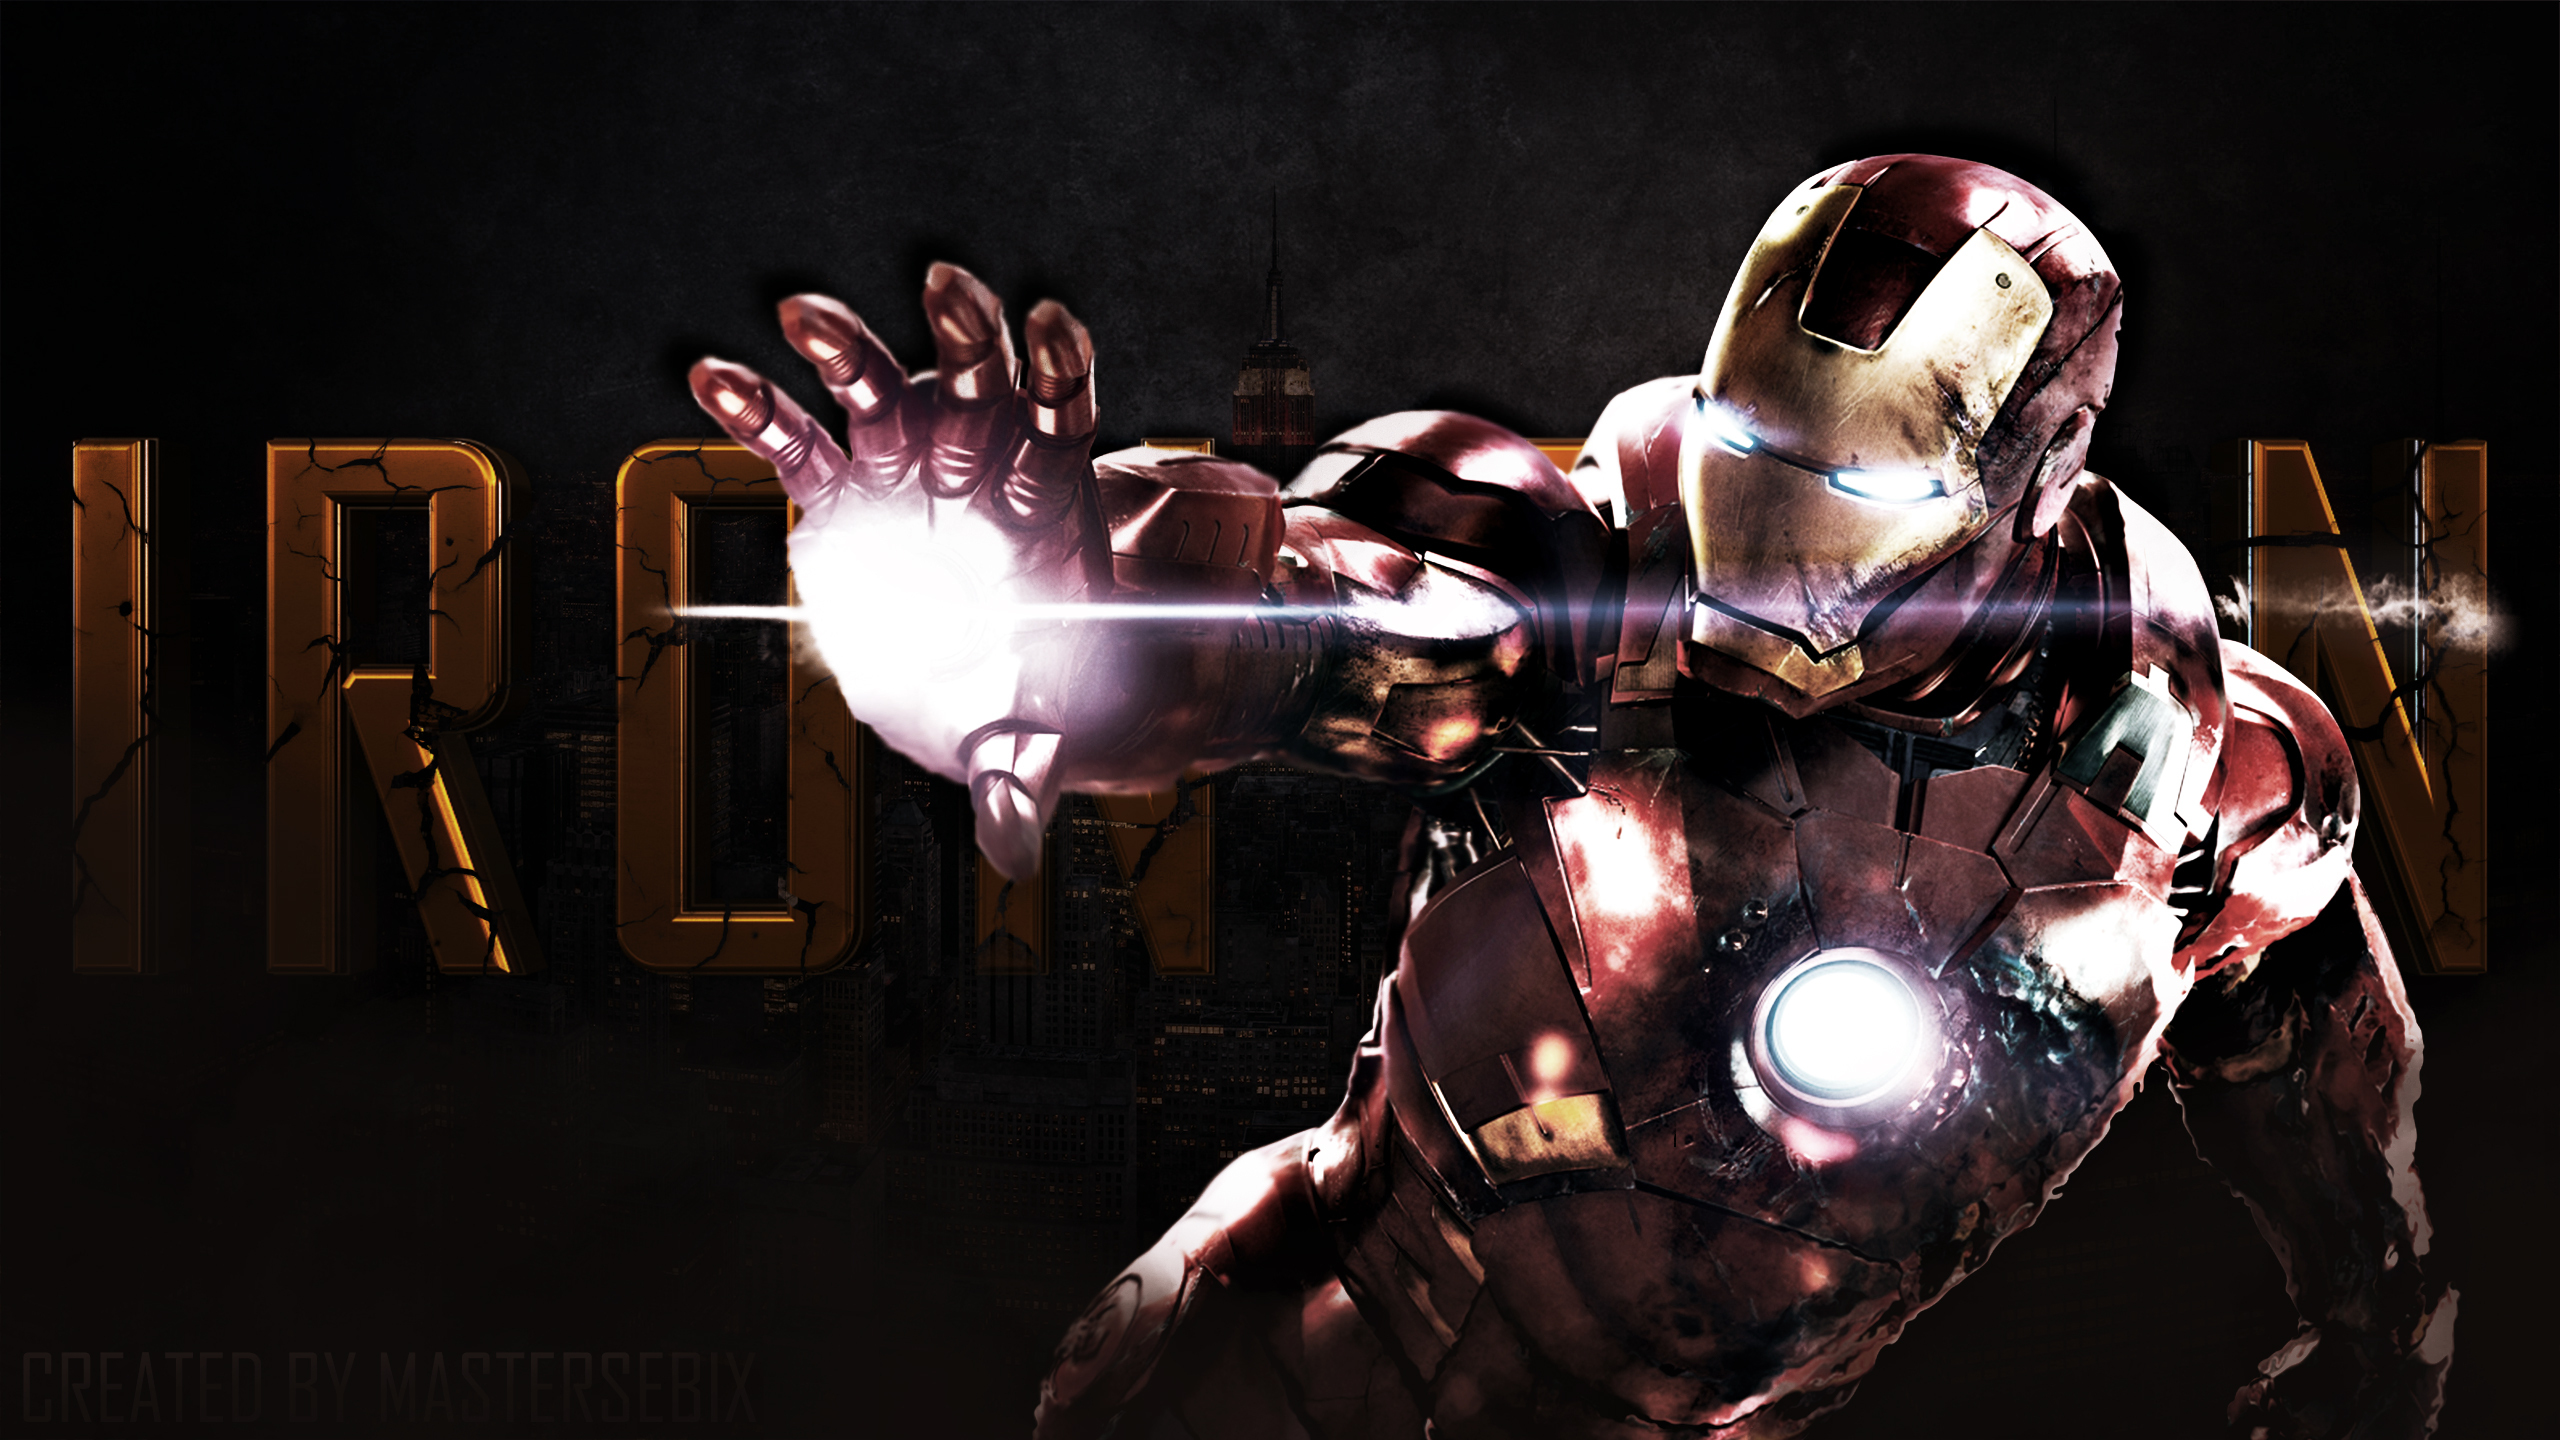 Iron Man Wallpapers Hd Pictures Desktop Background: Iron Man Wallpapers, Pictures, Images